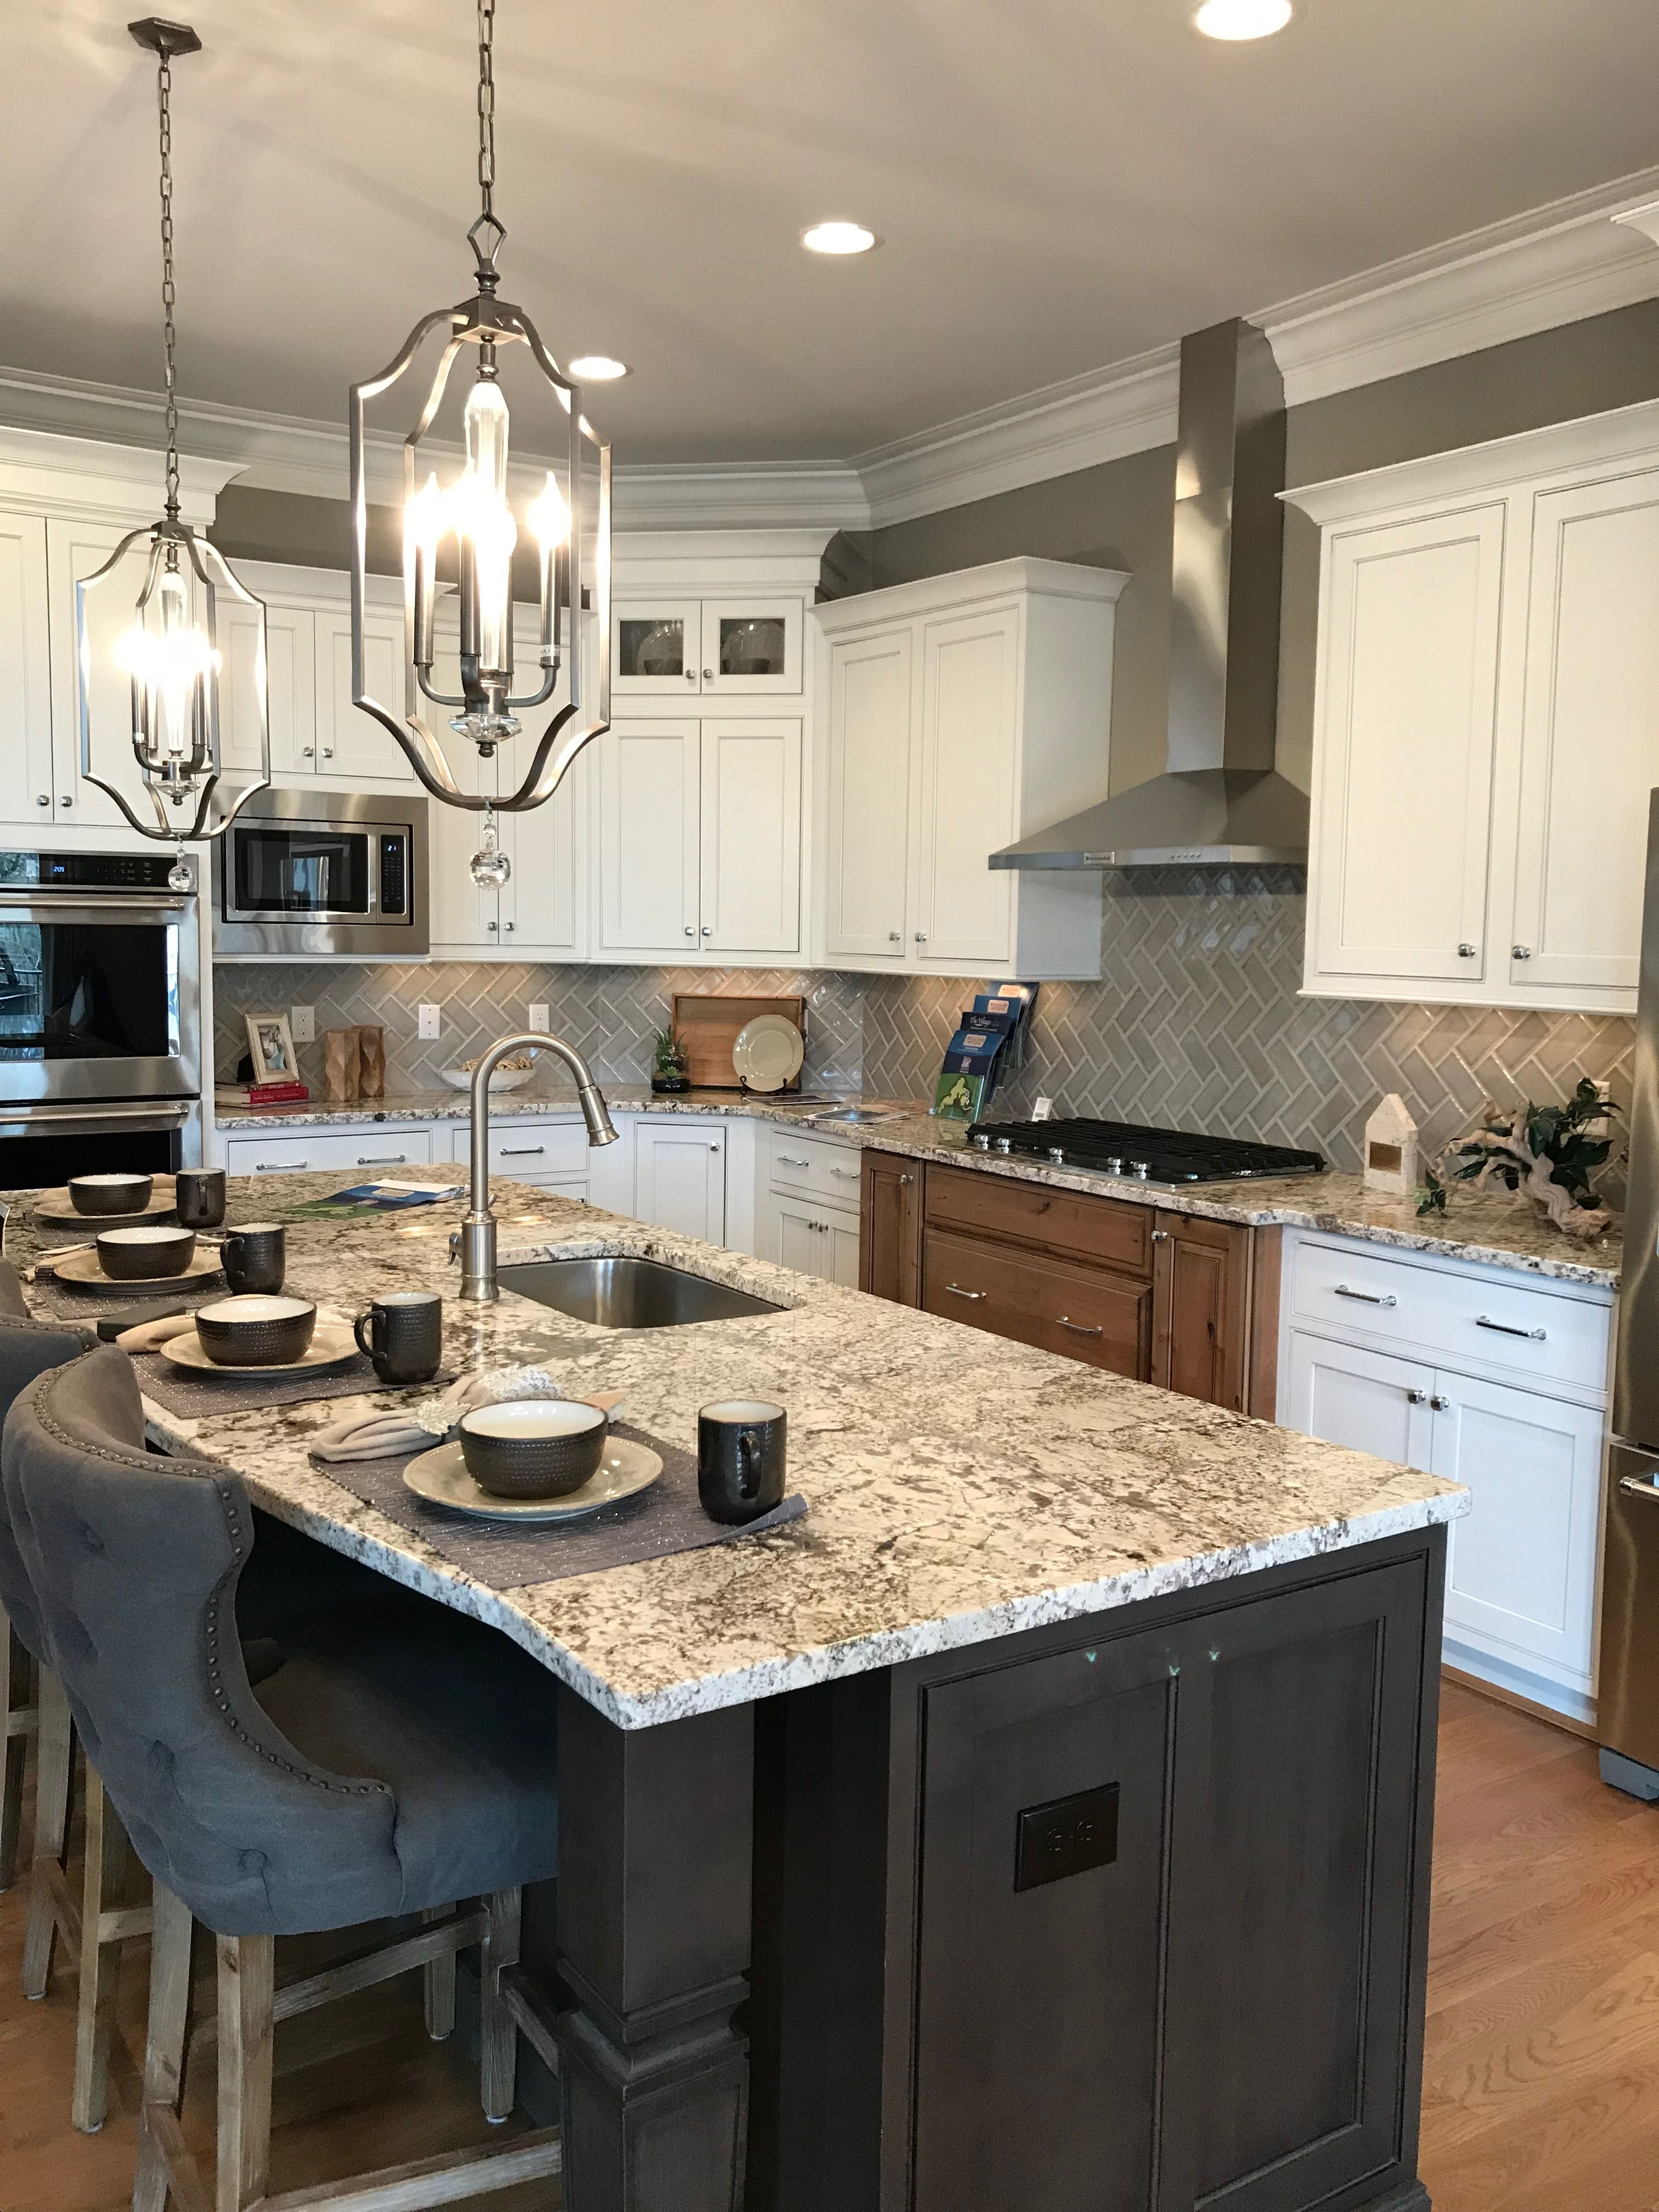 Mixed Cabinet Colors Probably Prefer 2 Rather Than 3 Kitchen Design Kitchen Remodel Modern Kitchen Design